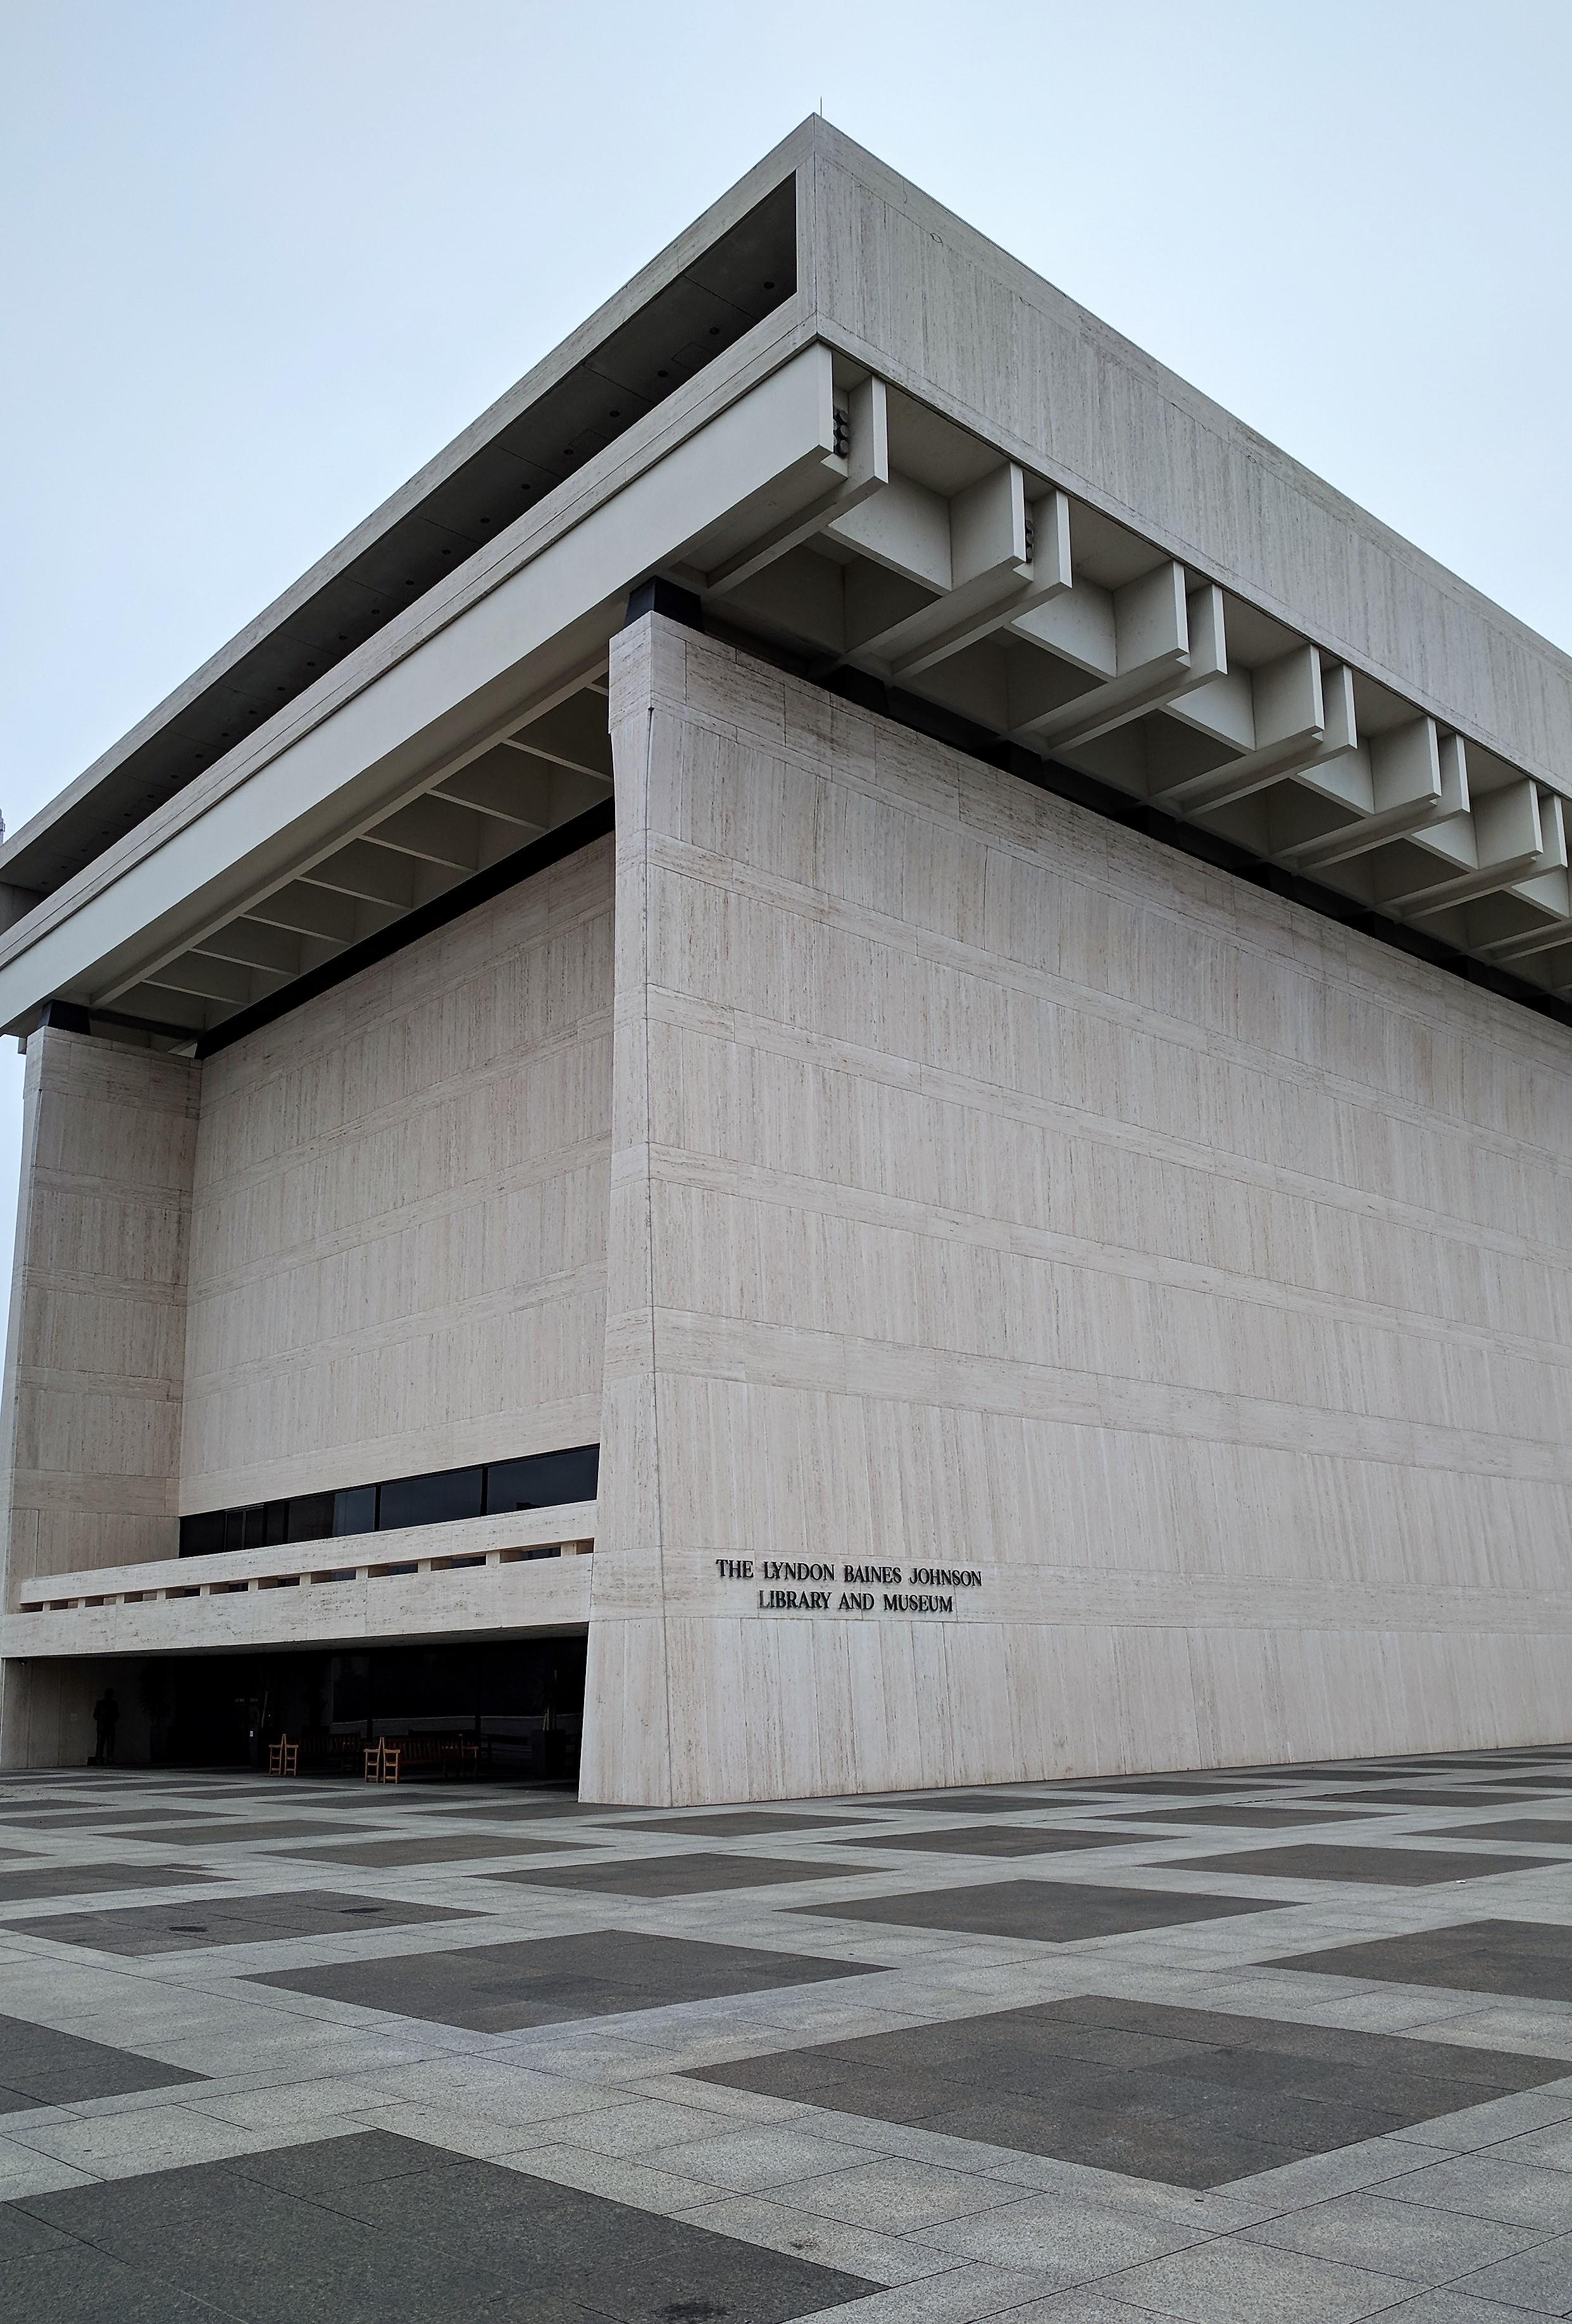 LBJ Presidential Library